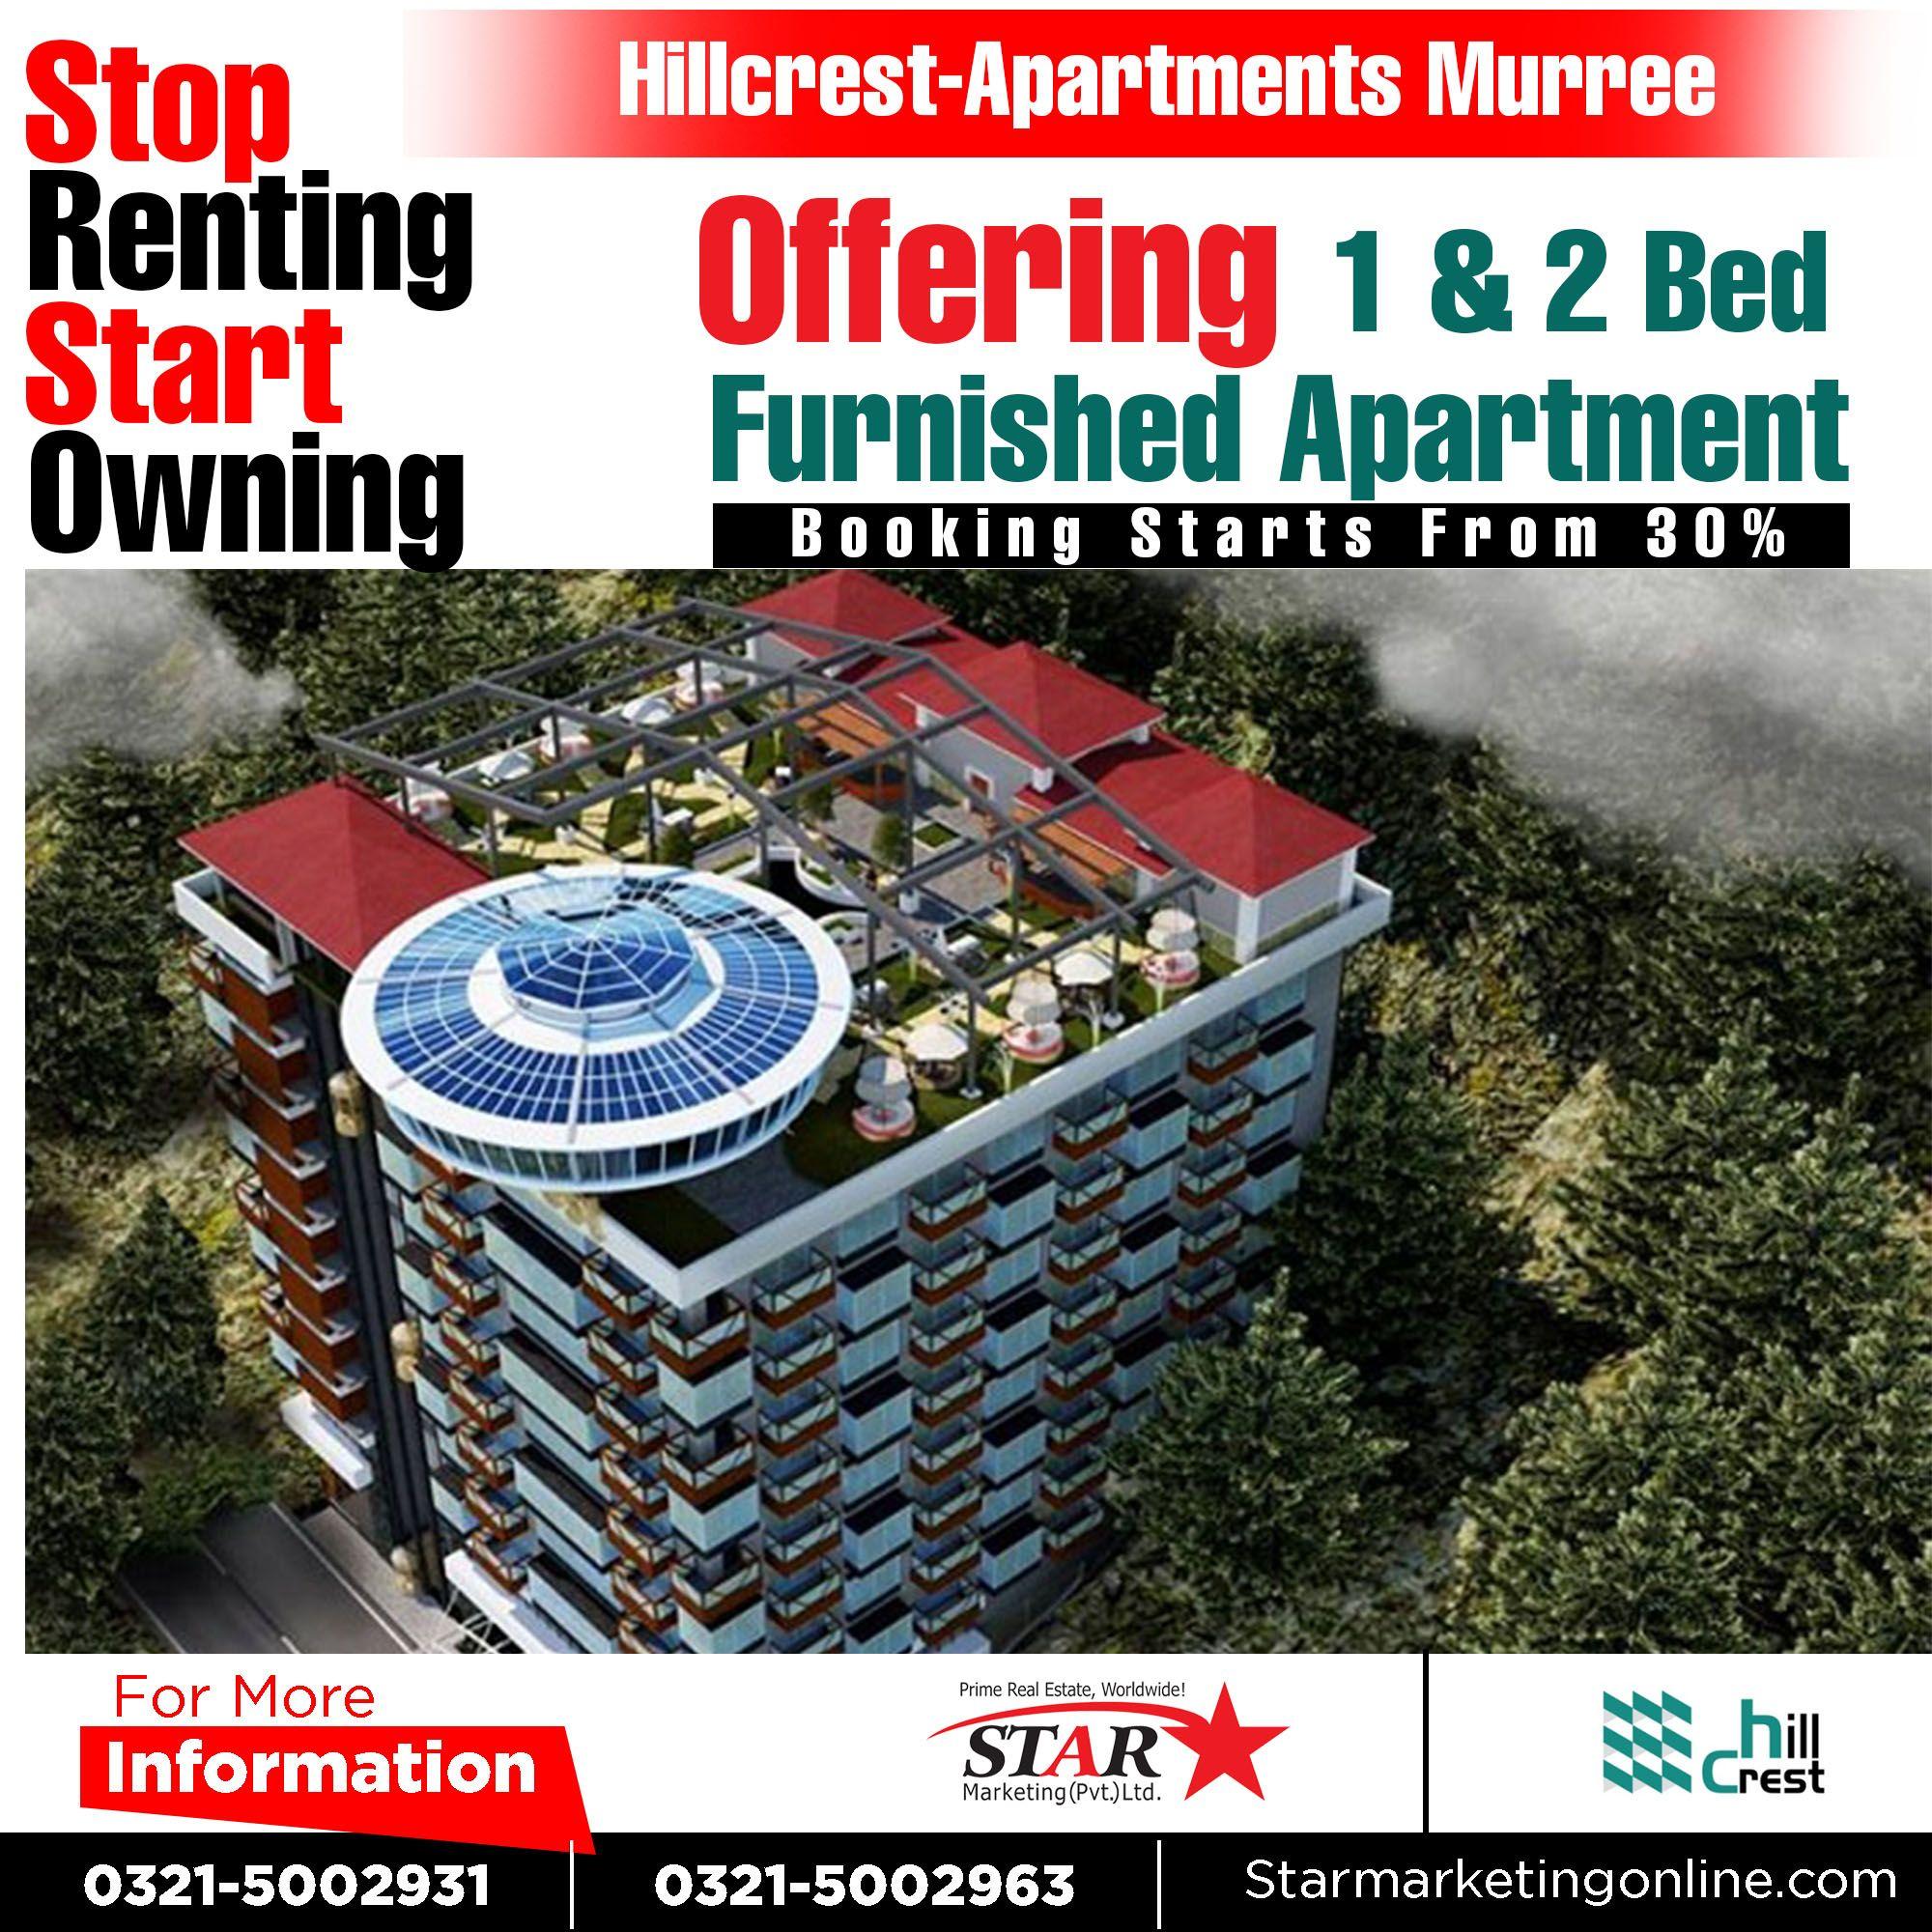 Hill Crest Murree Murree Beautiful Locations Furnished Apartment